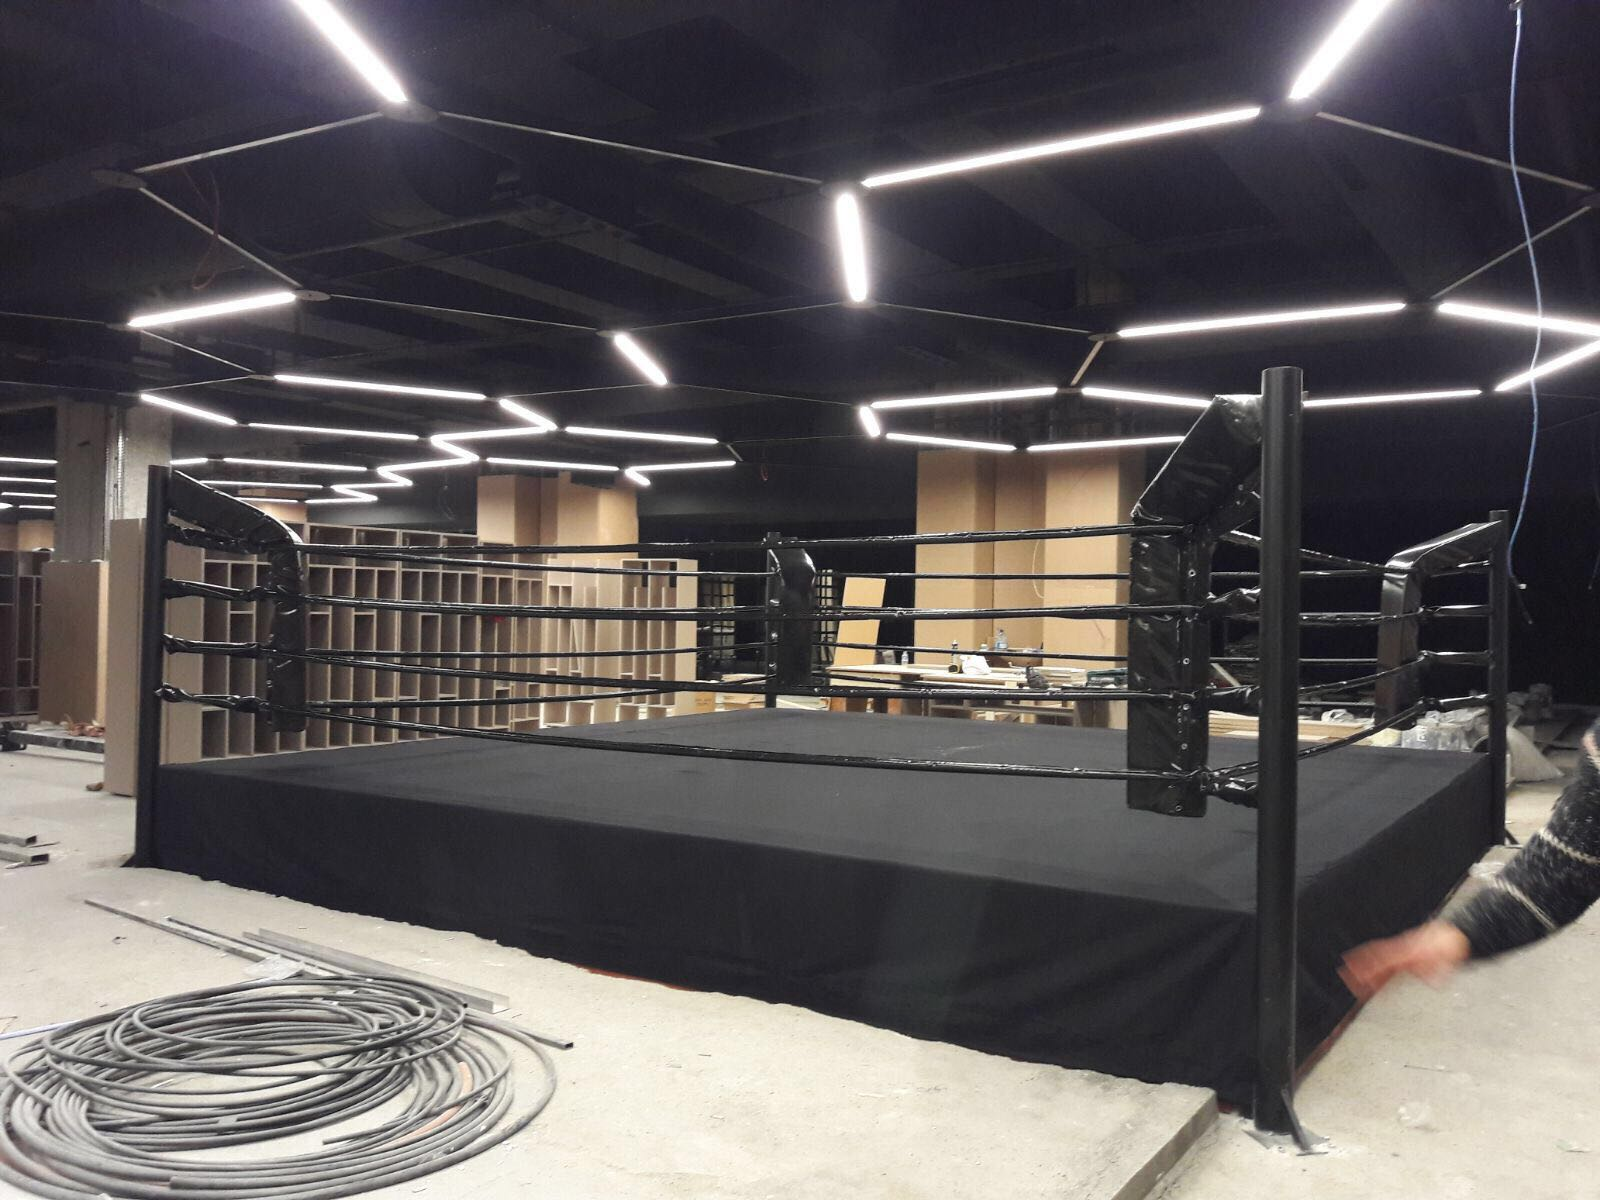 Bursa marka AVM spor merkezine boks ringi teslim edilmiştir